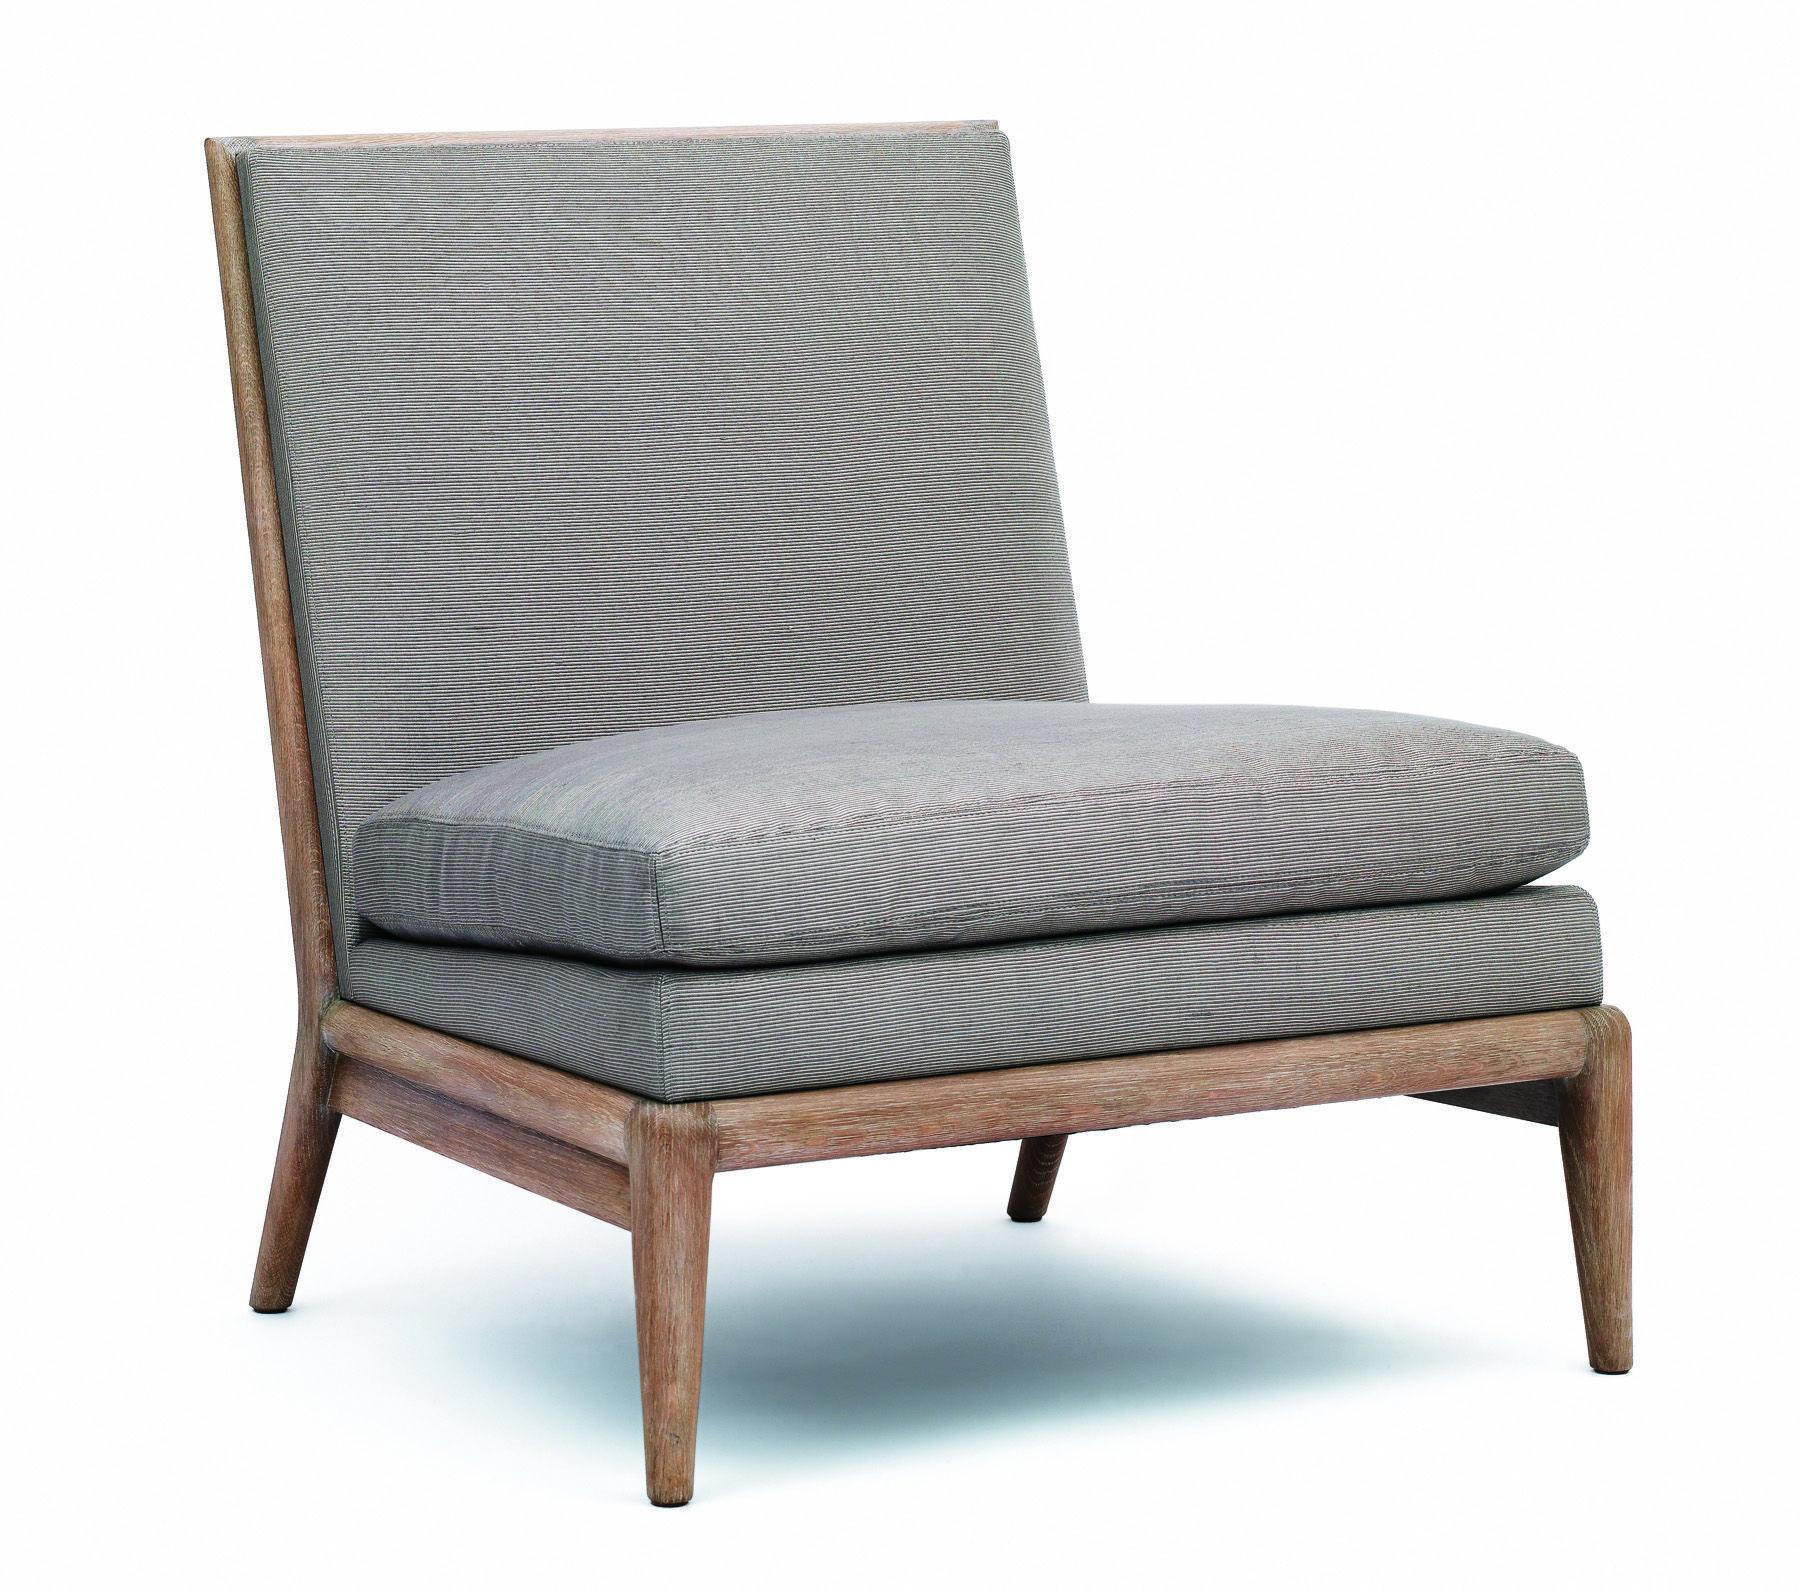 Christian Liaigre Infante Lounge Chair Loungechair Lounge Chair